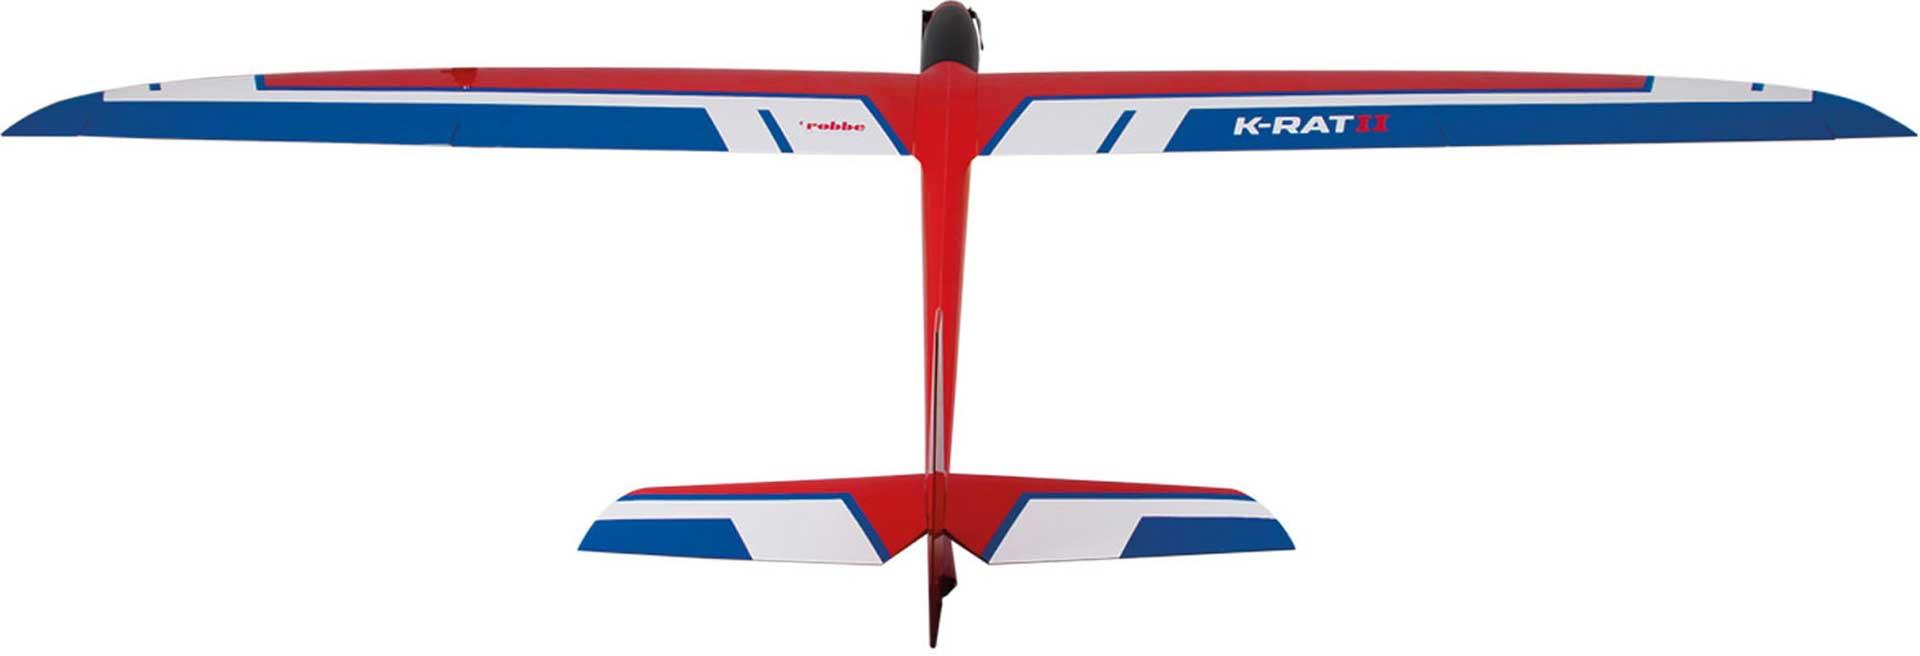 Robbe Modellsport K-RAT II PNP